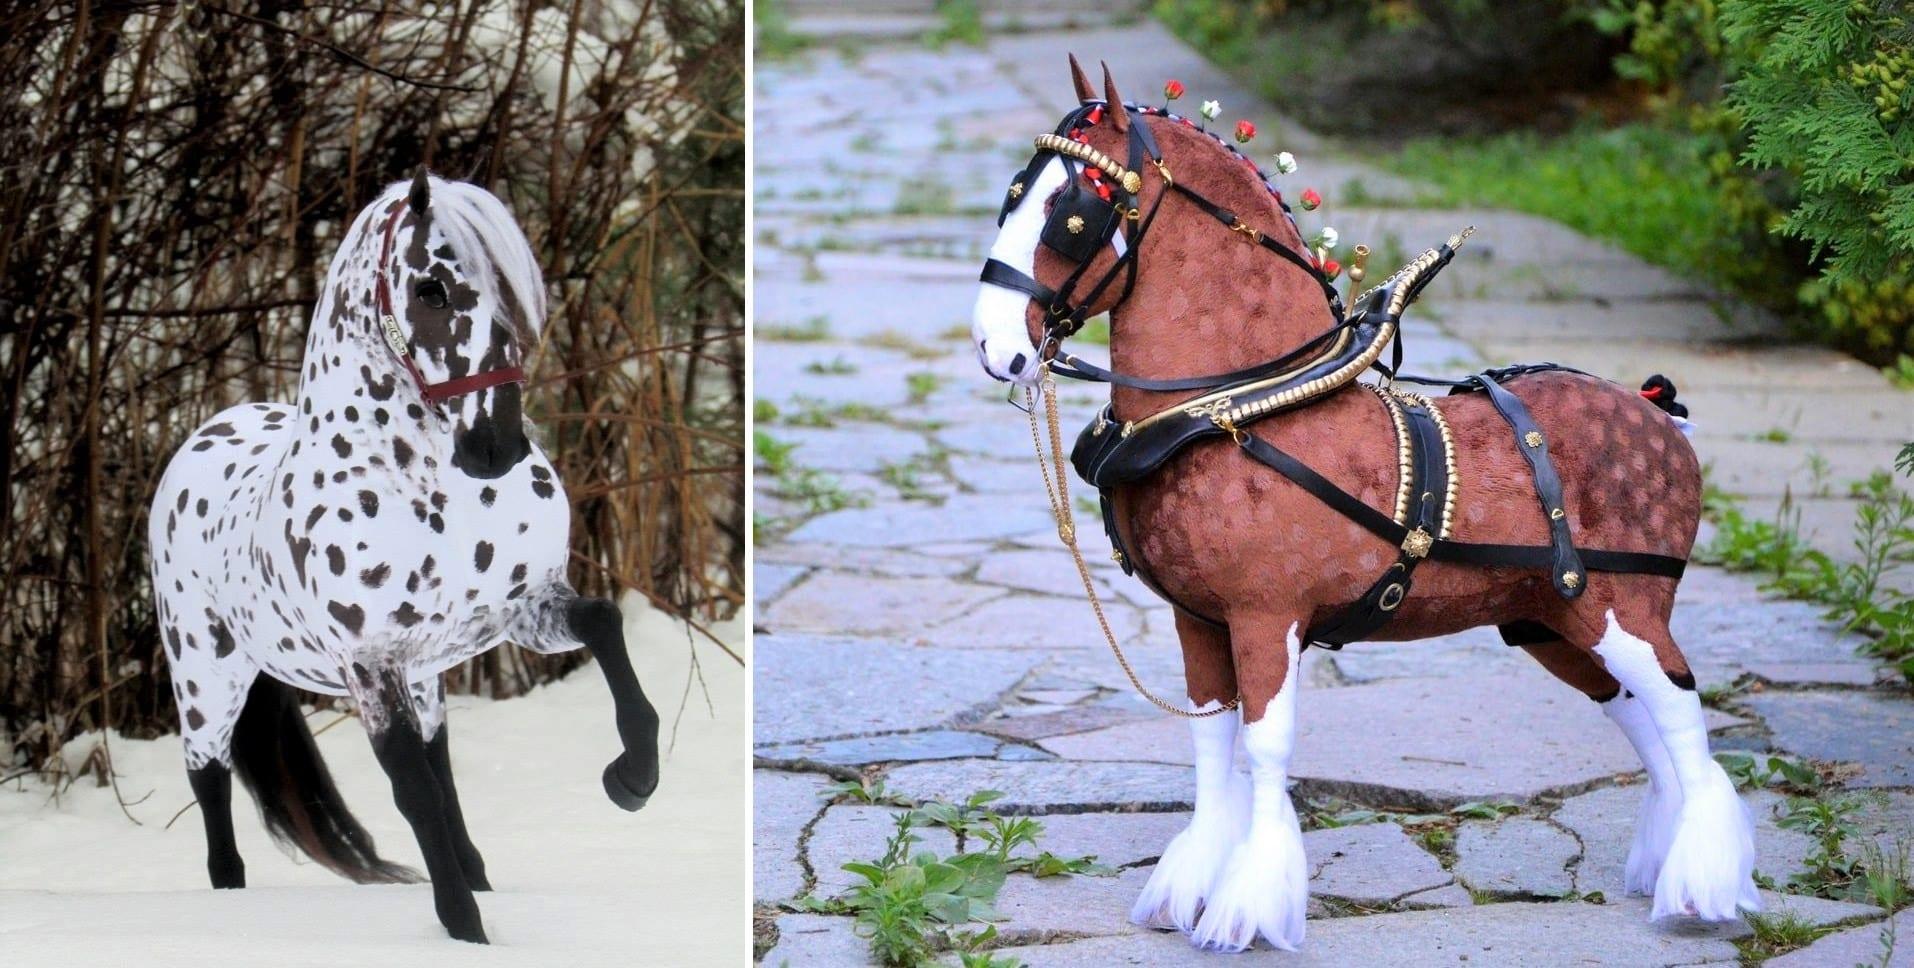 Custom plush horses created by Ekaterina Yakovenko